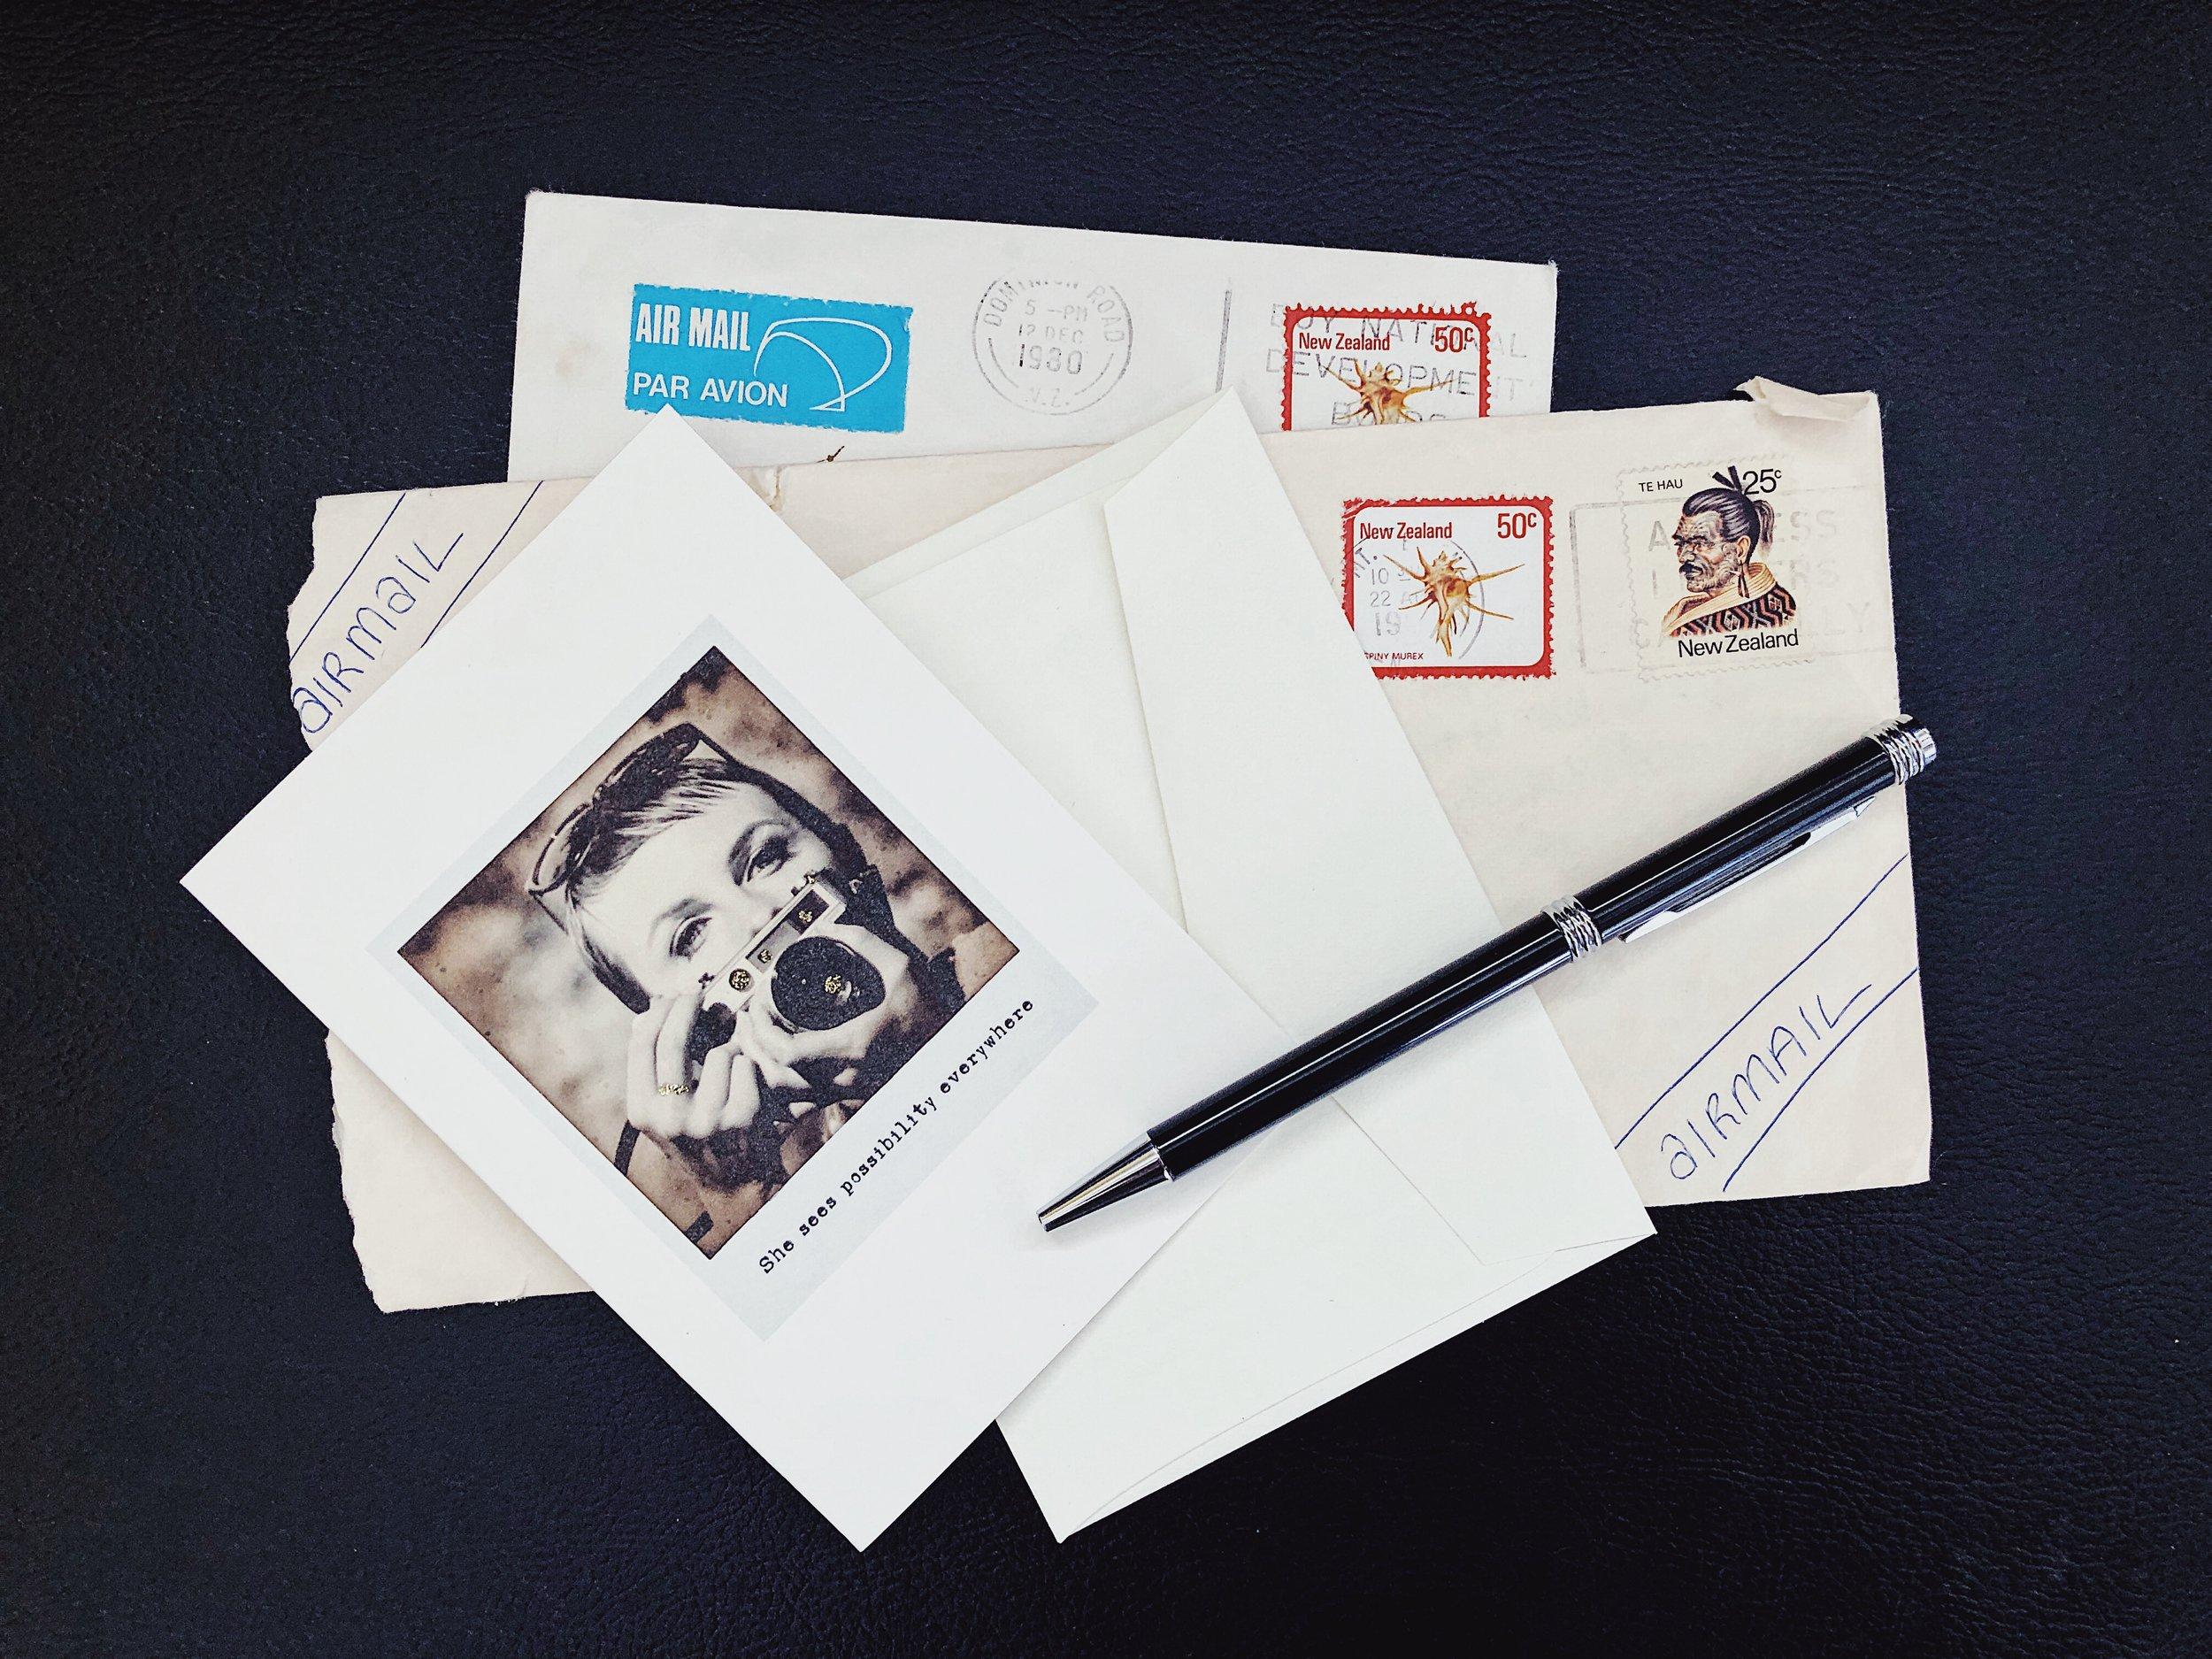 kat-edmonson-sparkle-and-shine-card-set-polaroid-styled.JPG